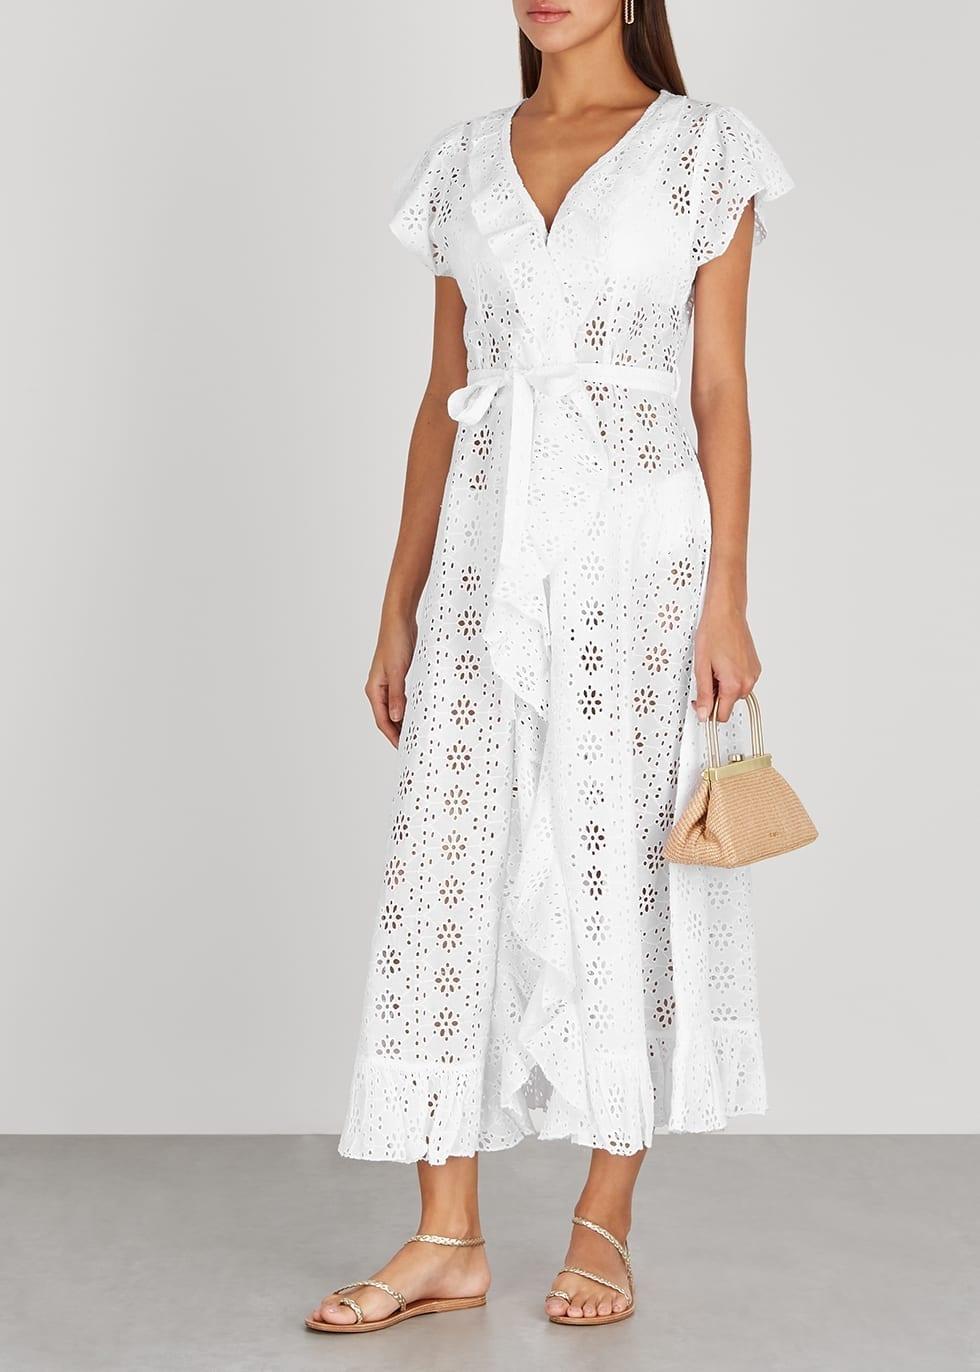 MELISSA ODABASH Brianna White Broderie Anglaise Wrap Dress